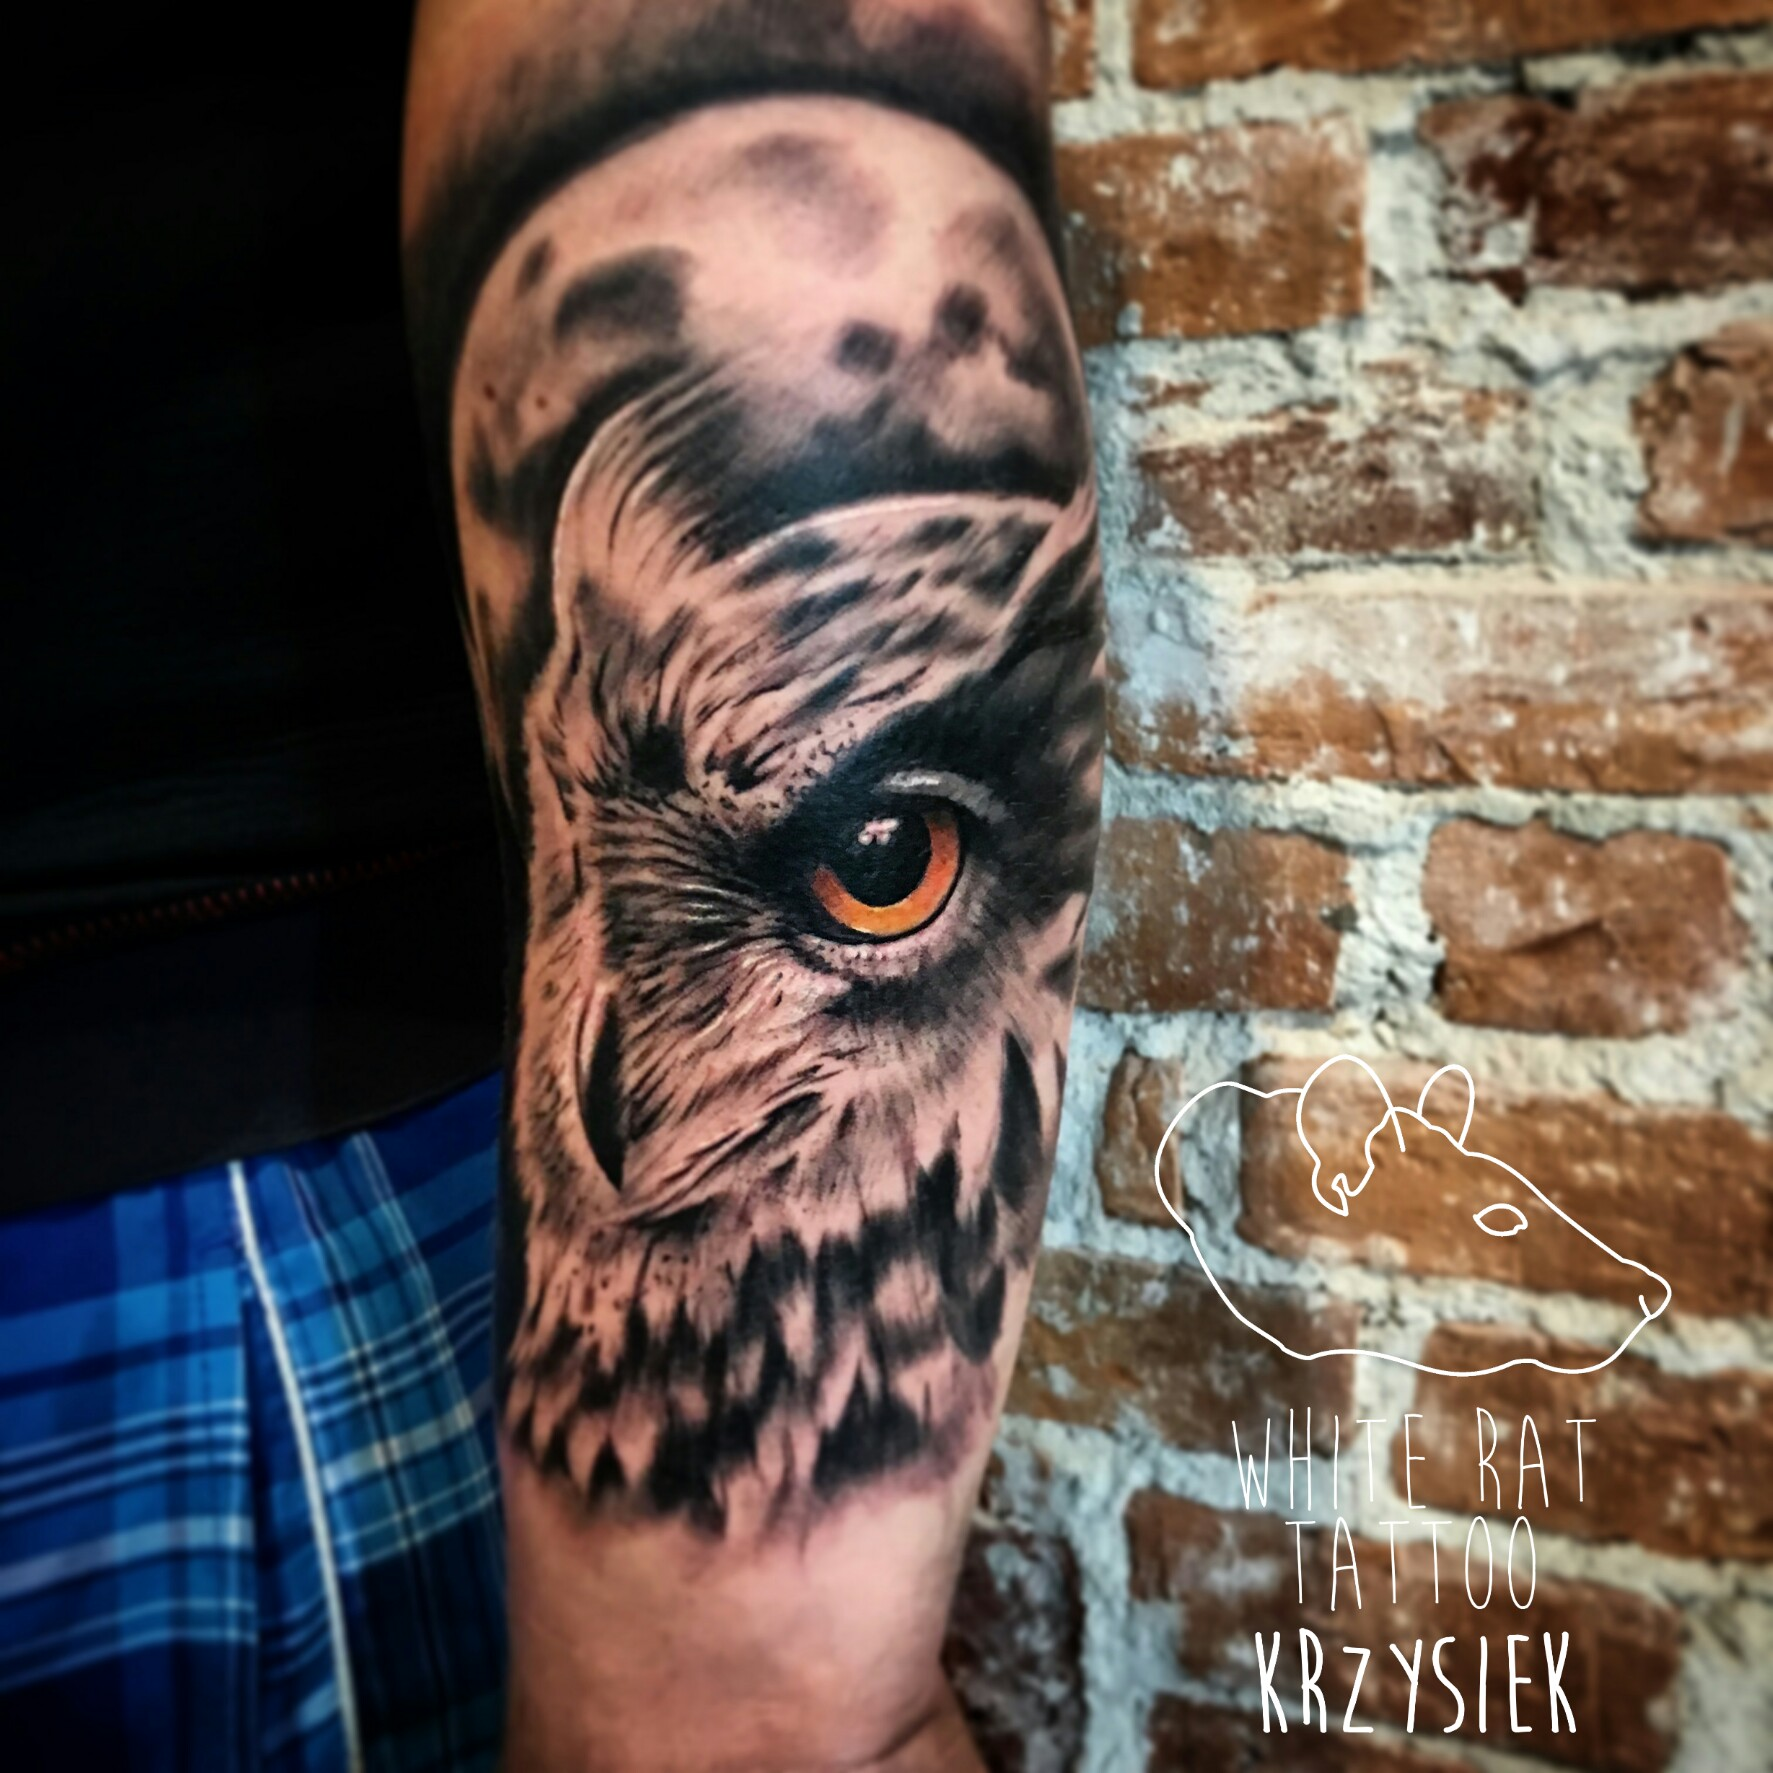 Studio Tatuażu Warszawa Krzysztof Jakubowski Tatuaż Sowa White Rat